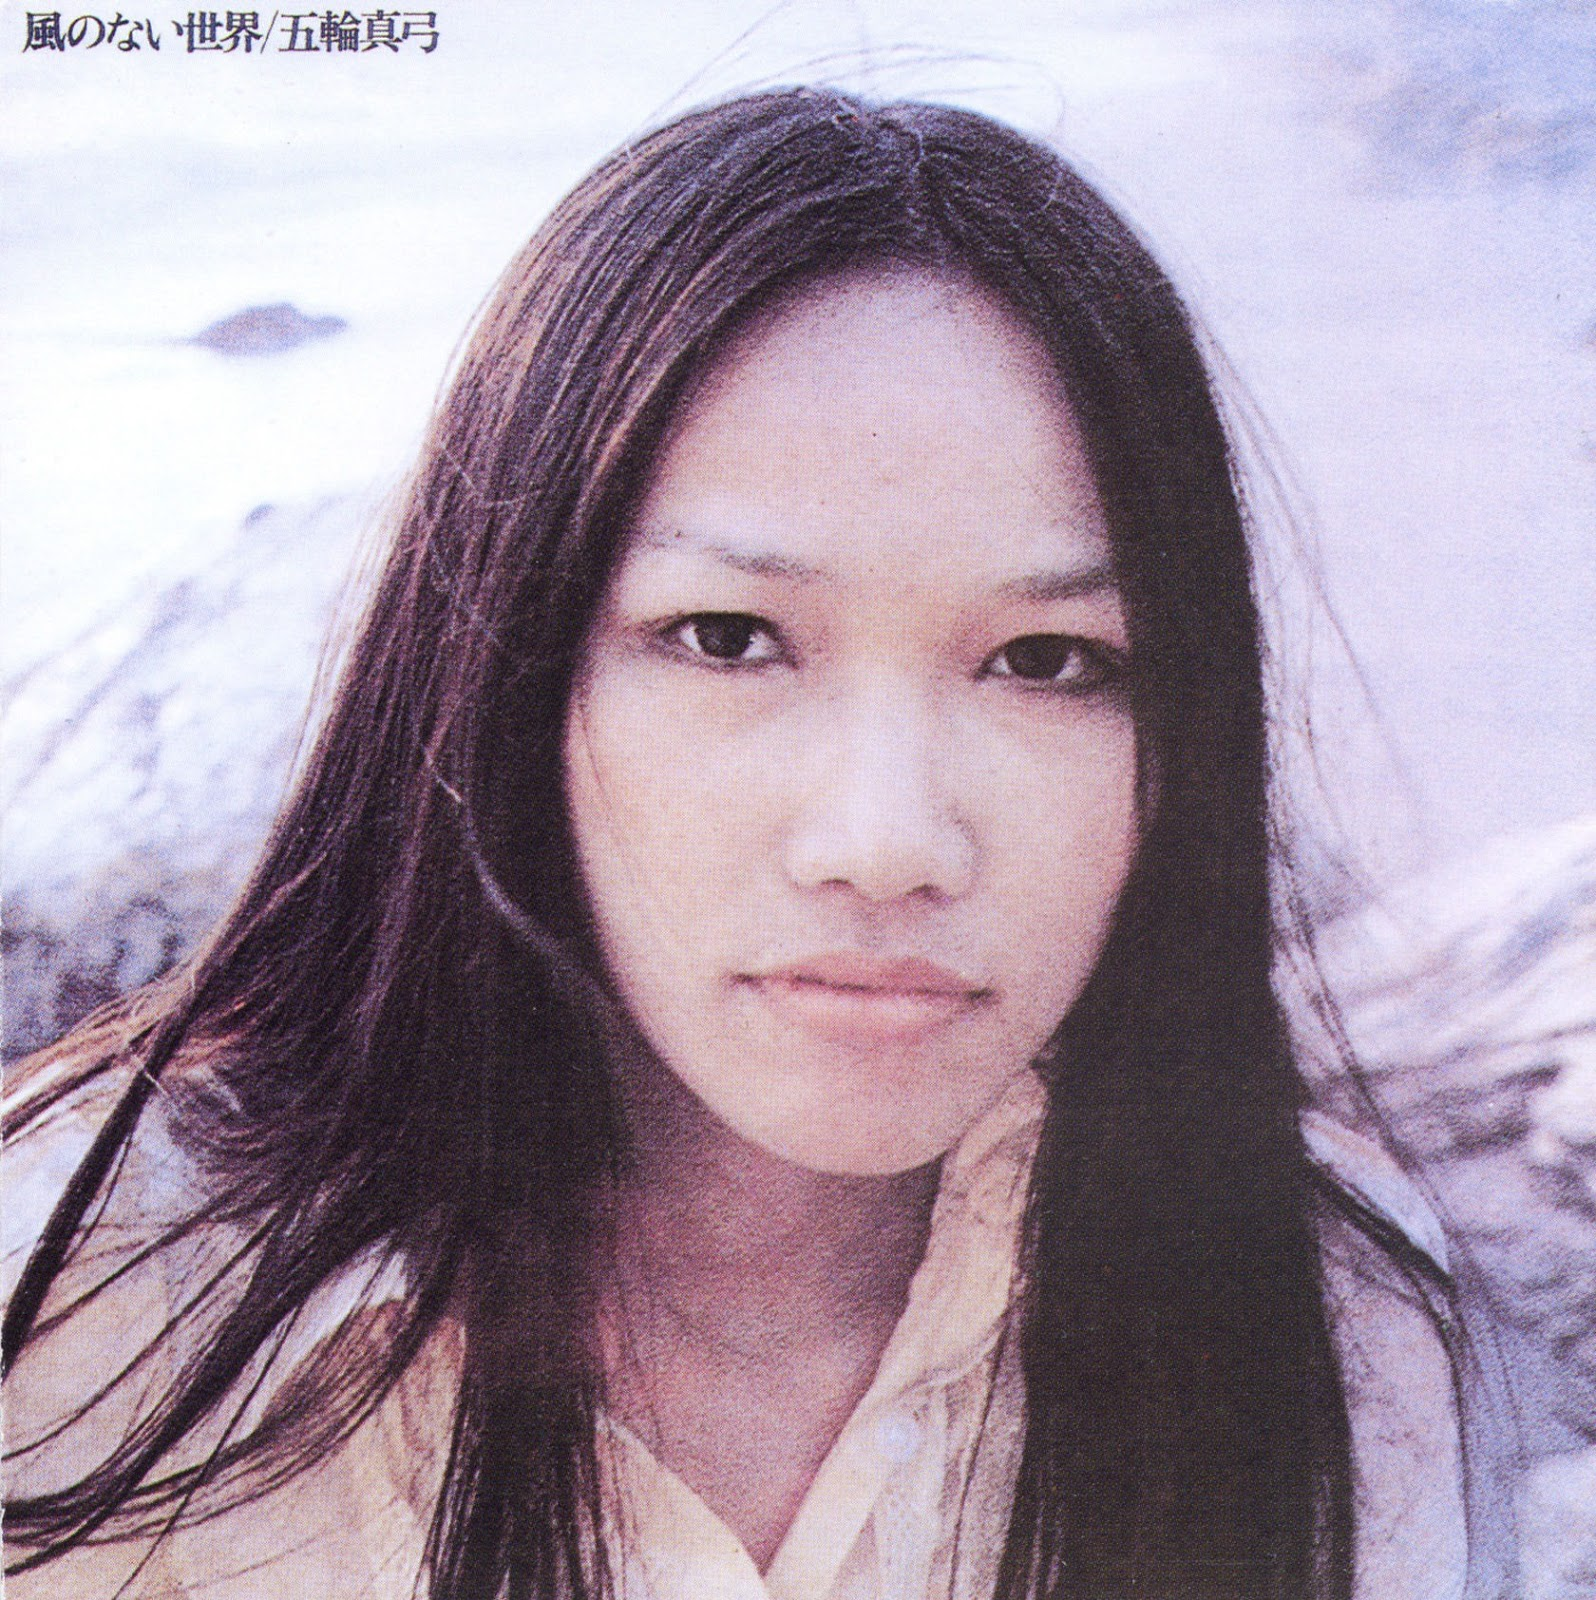 JPOP80SS: Mayumi Itsuwa (五輪 真弓)